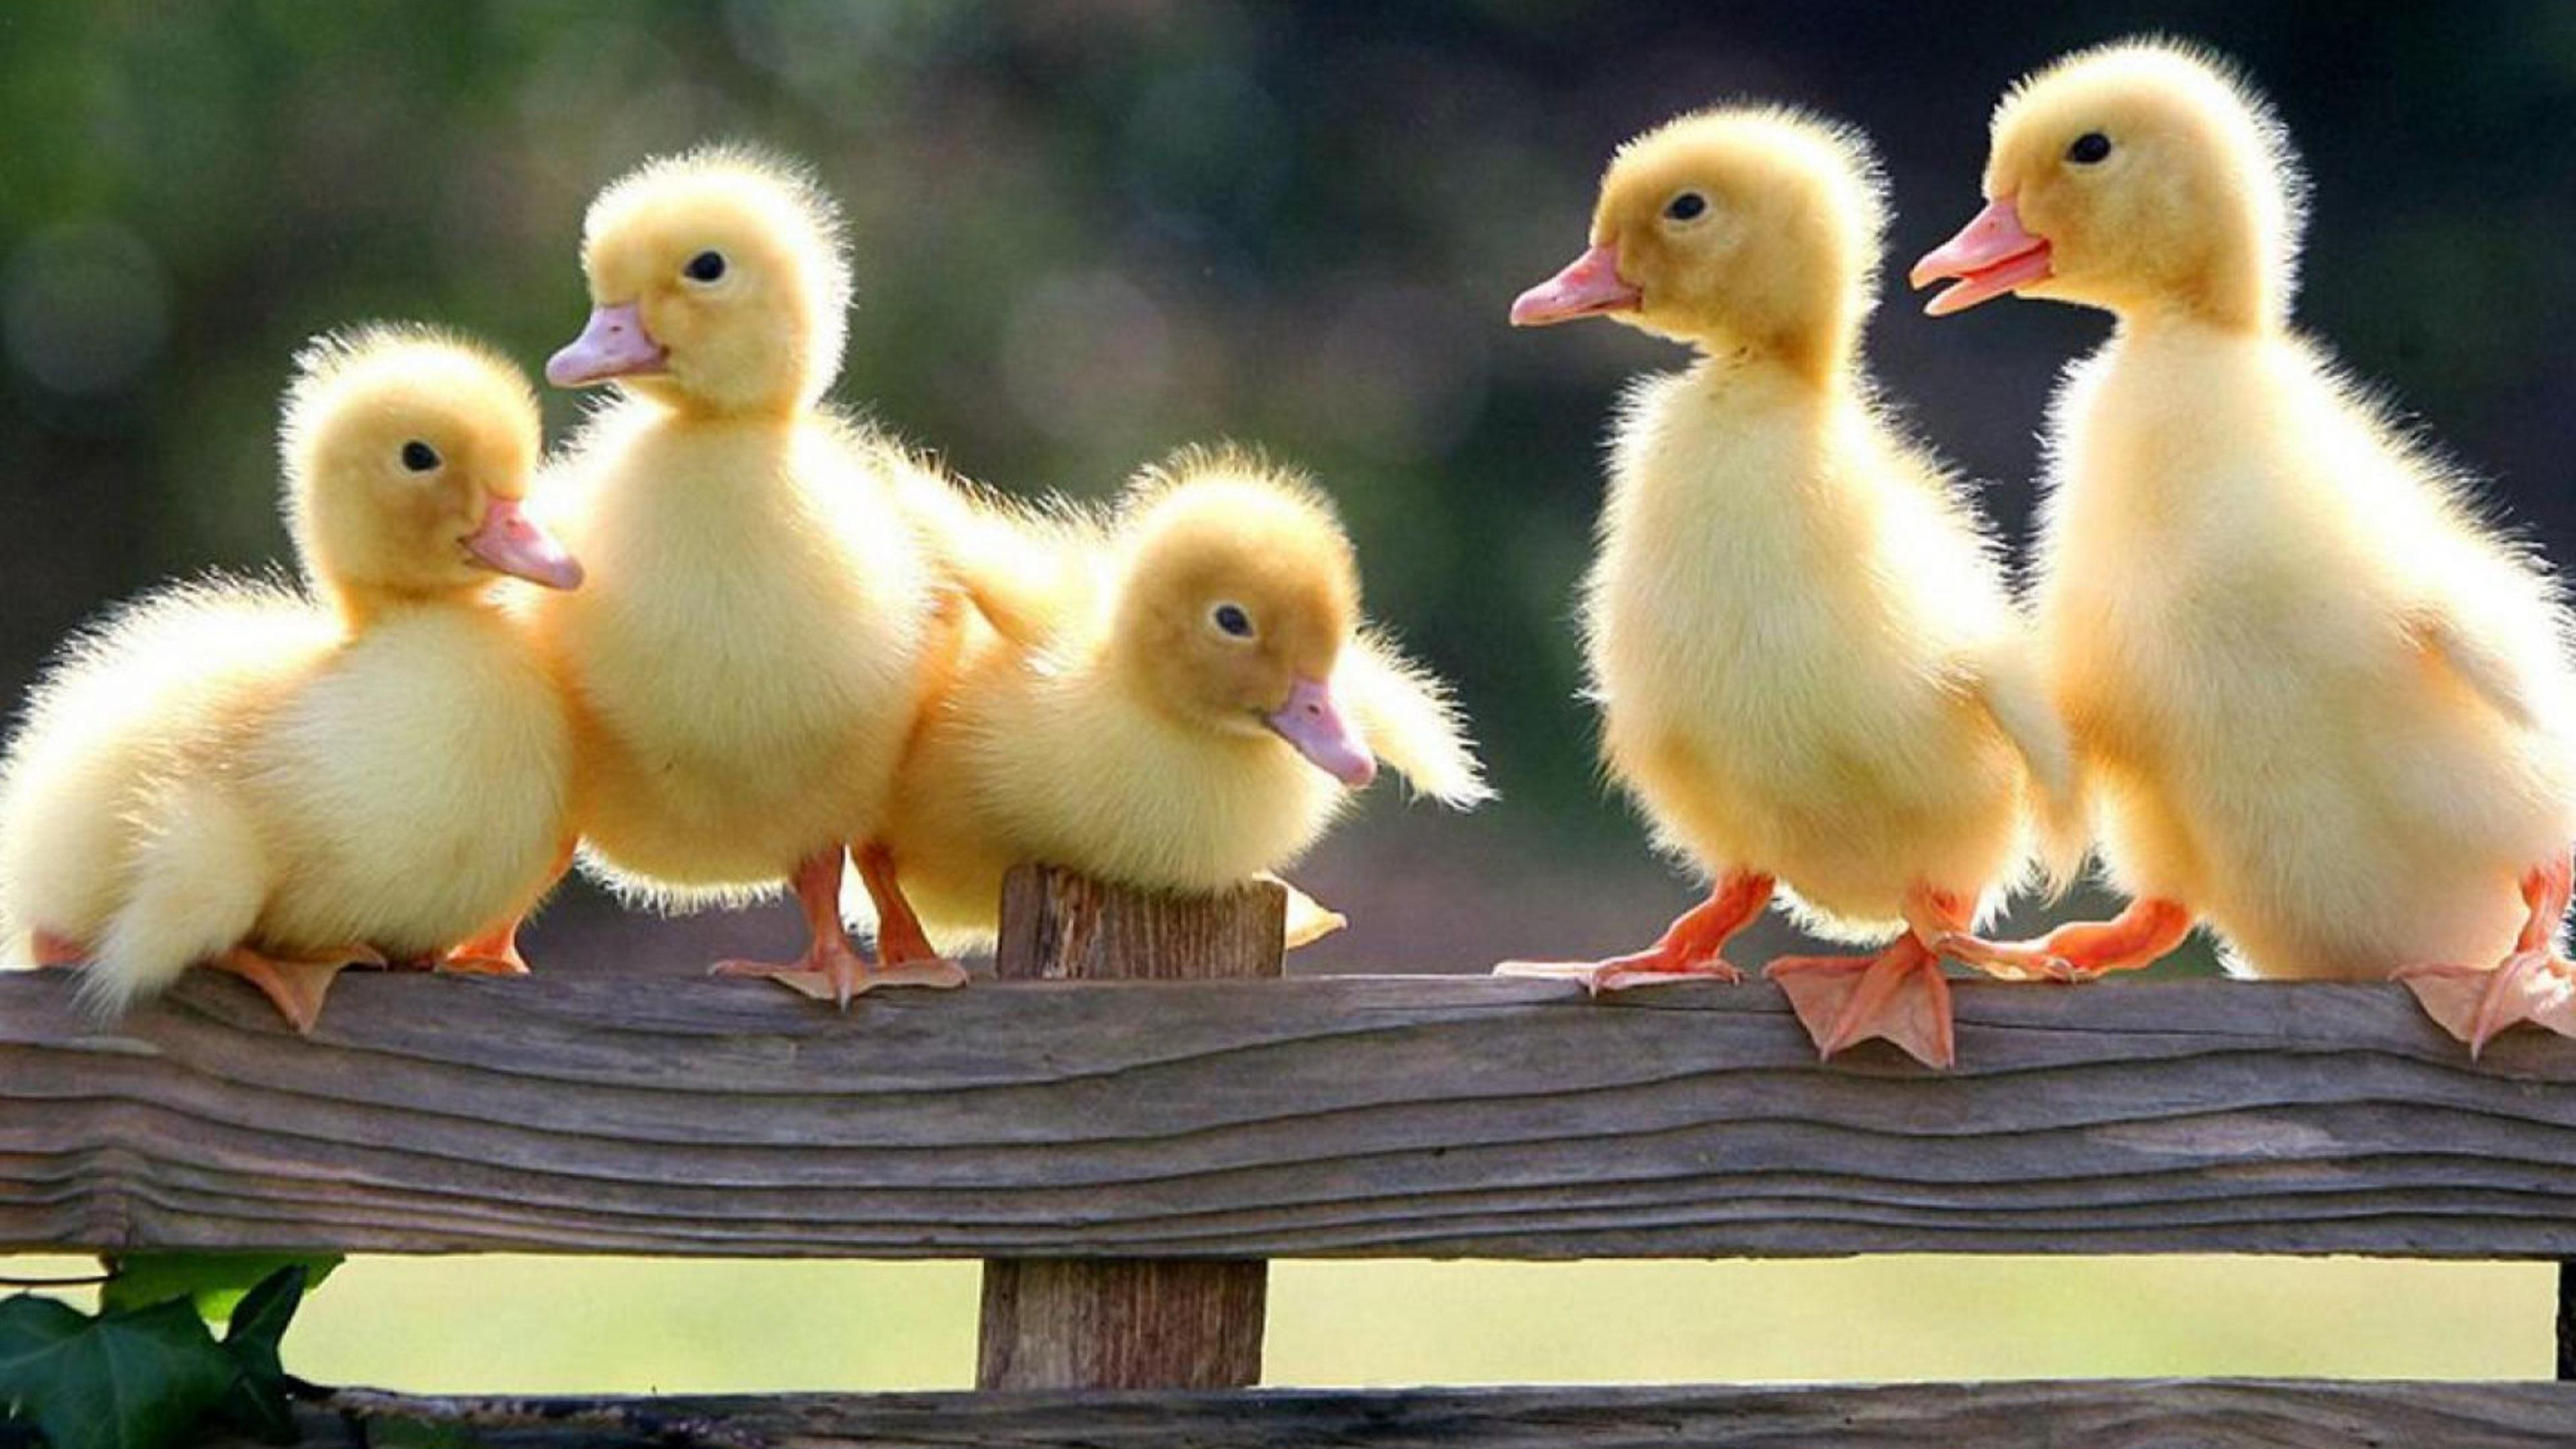 Res: 3840x2160, Cute Baby Ducks Wallpaper